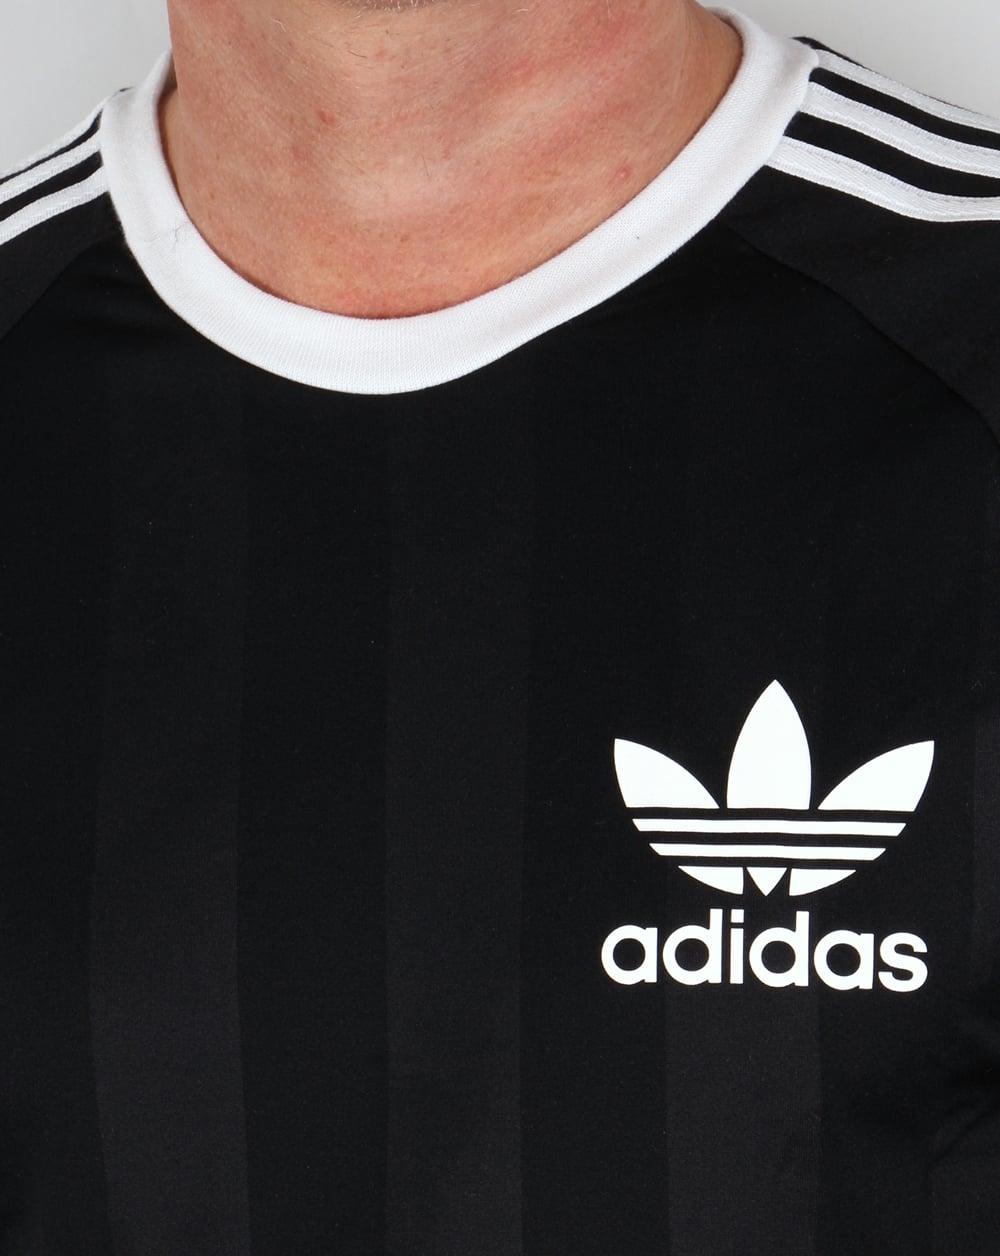 adidas 3 stripes ringer t shirt